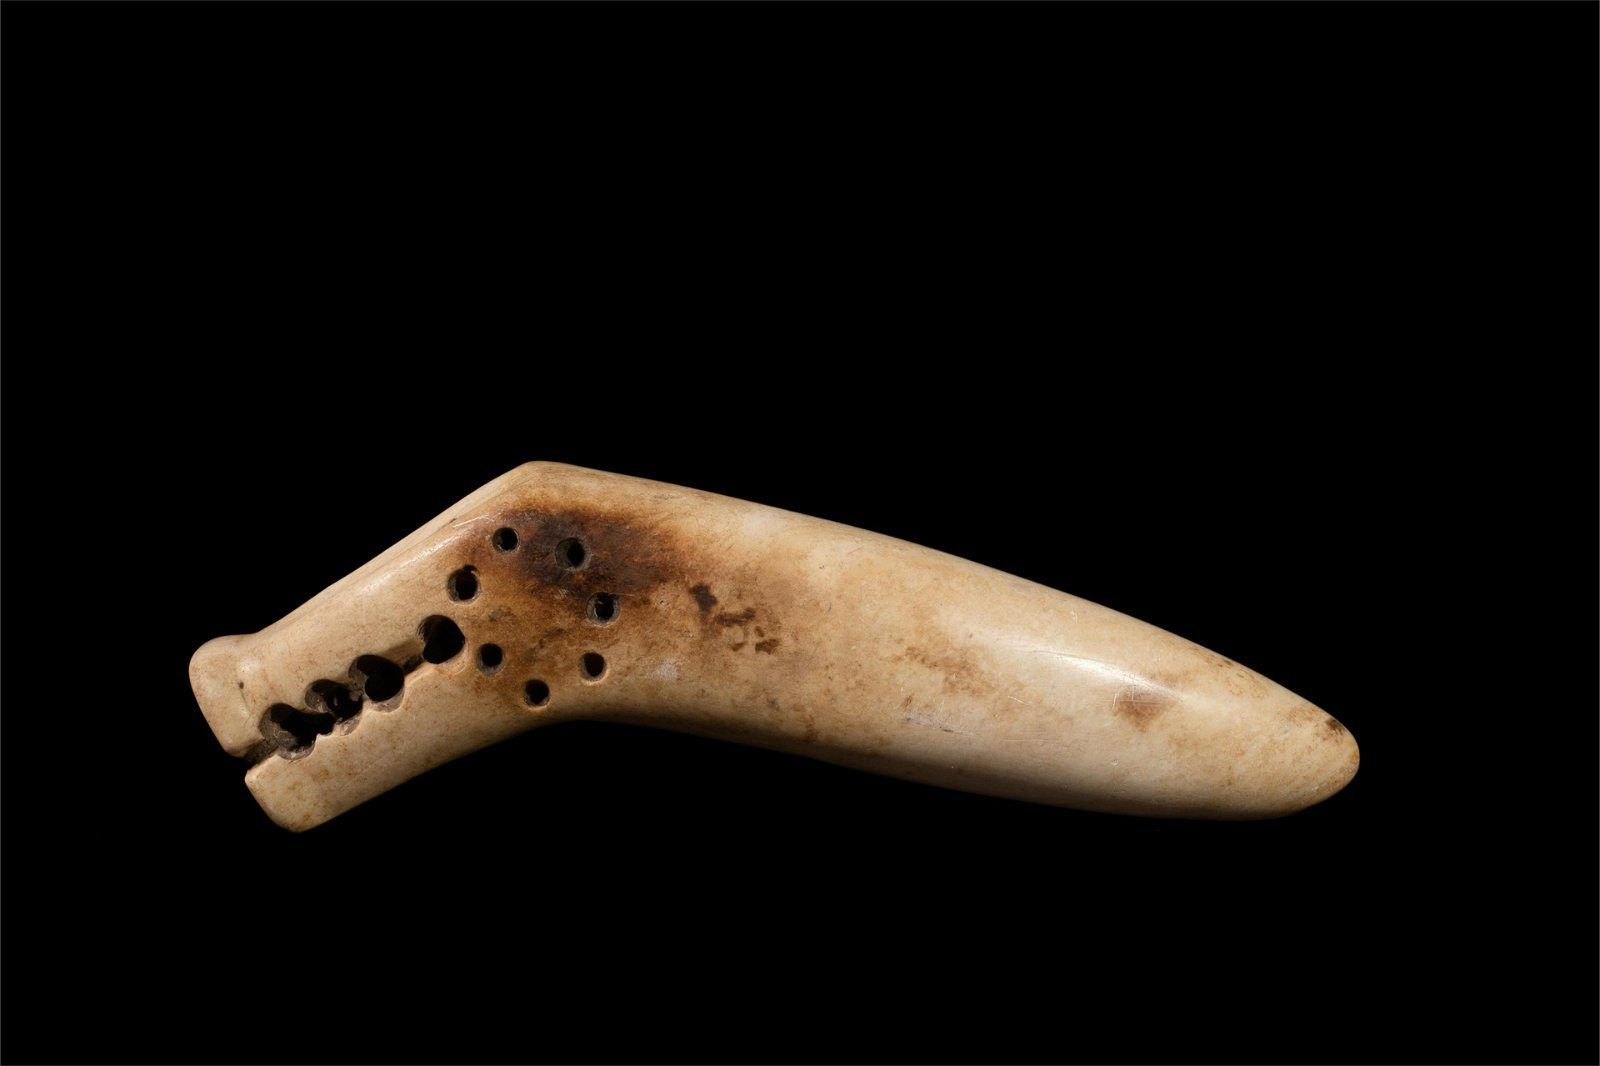 CHINESE ANCIENT JADE PENDANT